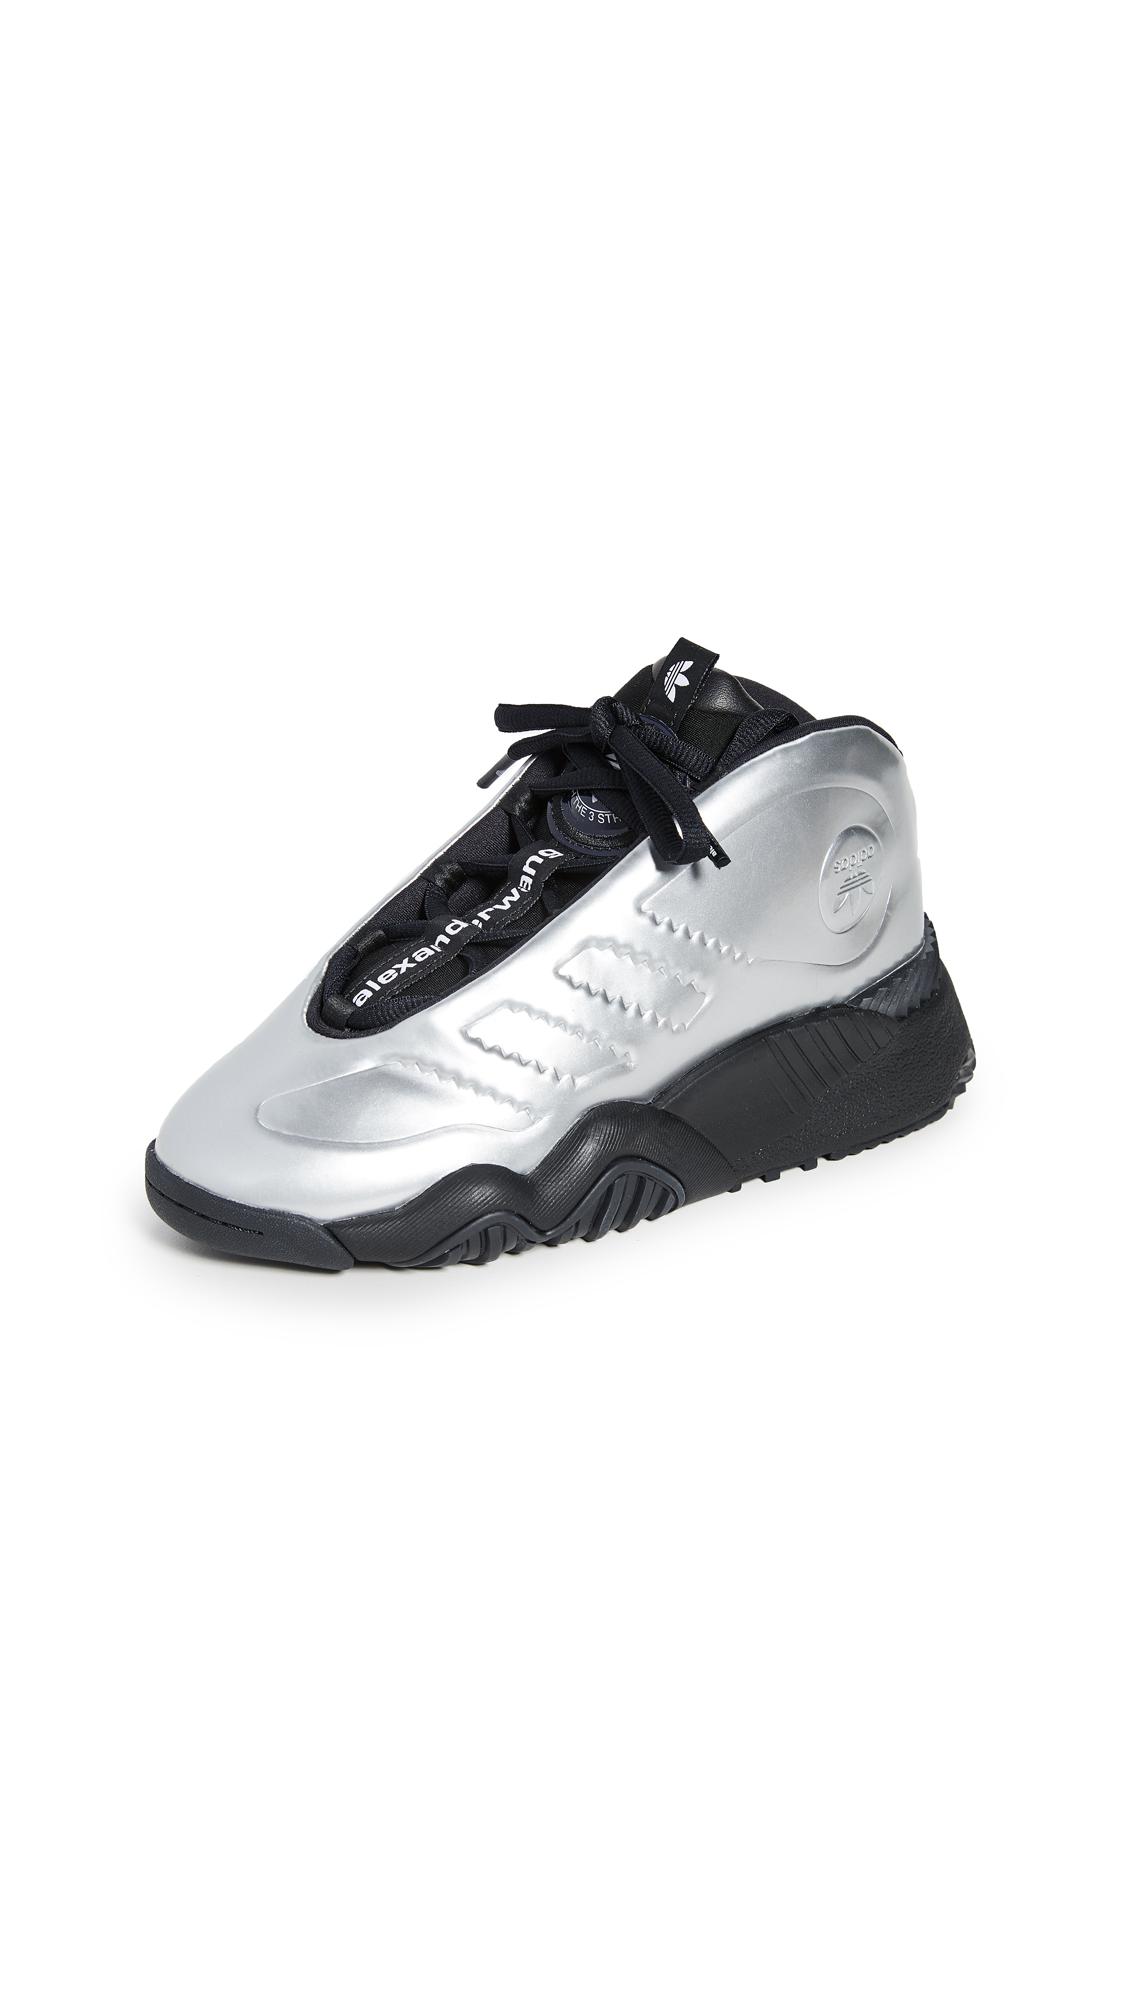 adidas Originals by Alexander Wang AW Futureshell Sneakers - Platin Met/Core Black